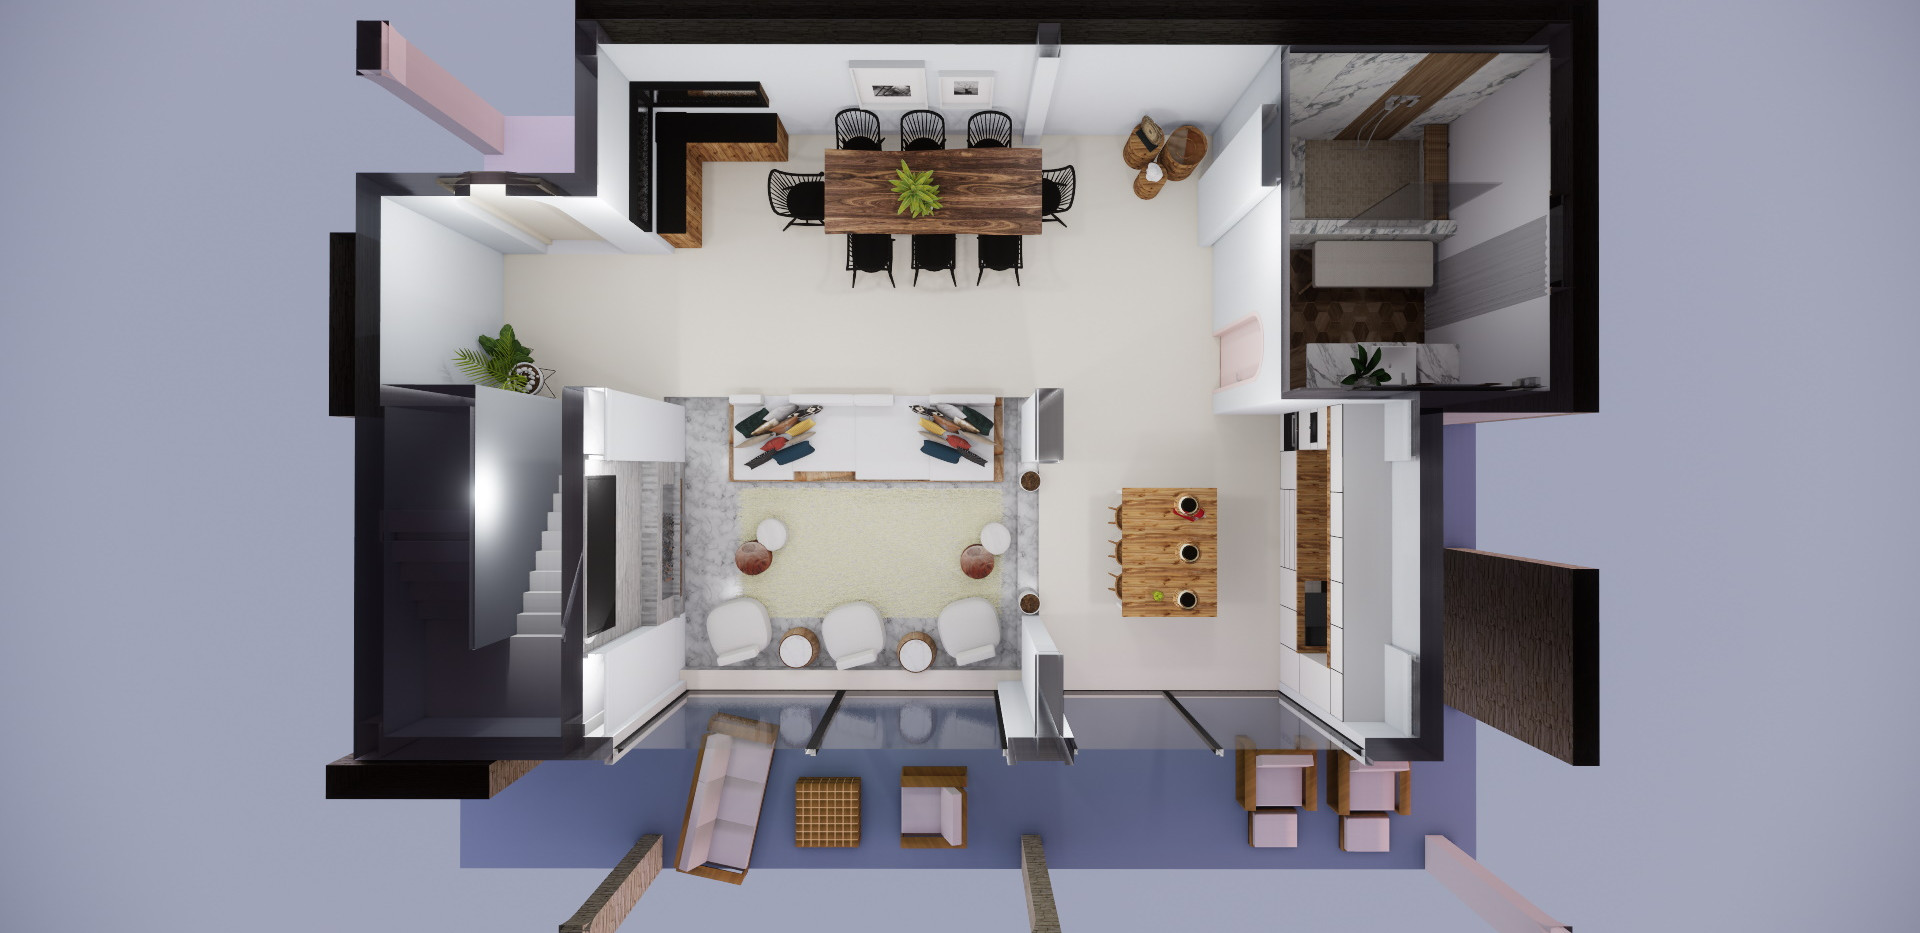 Floor Plan - Project Ibiza